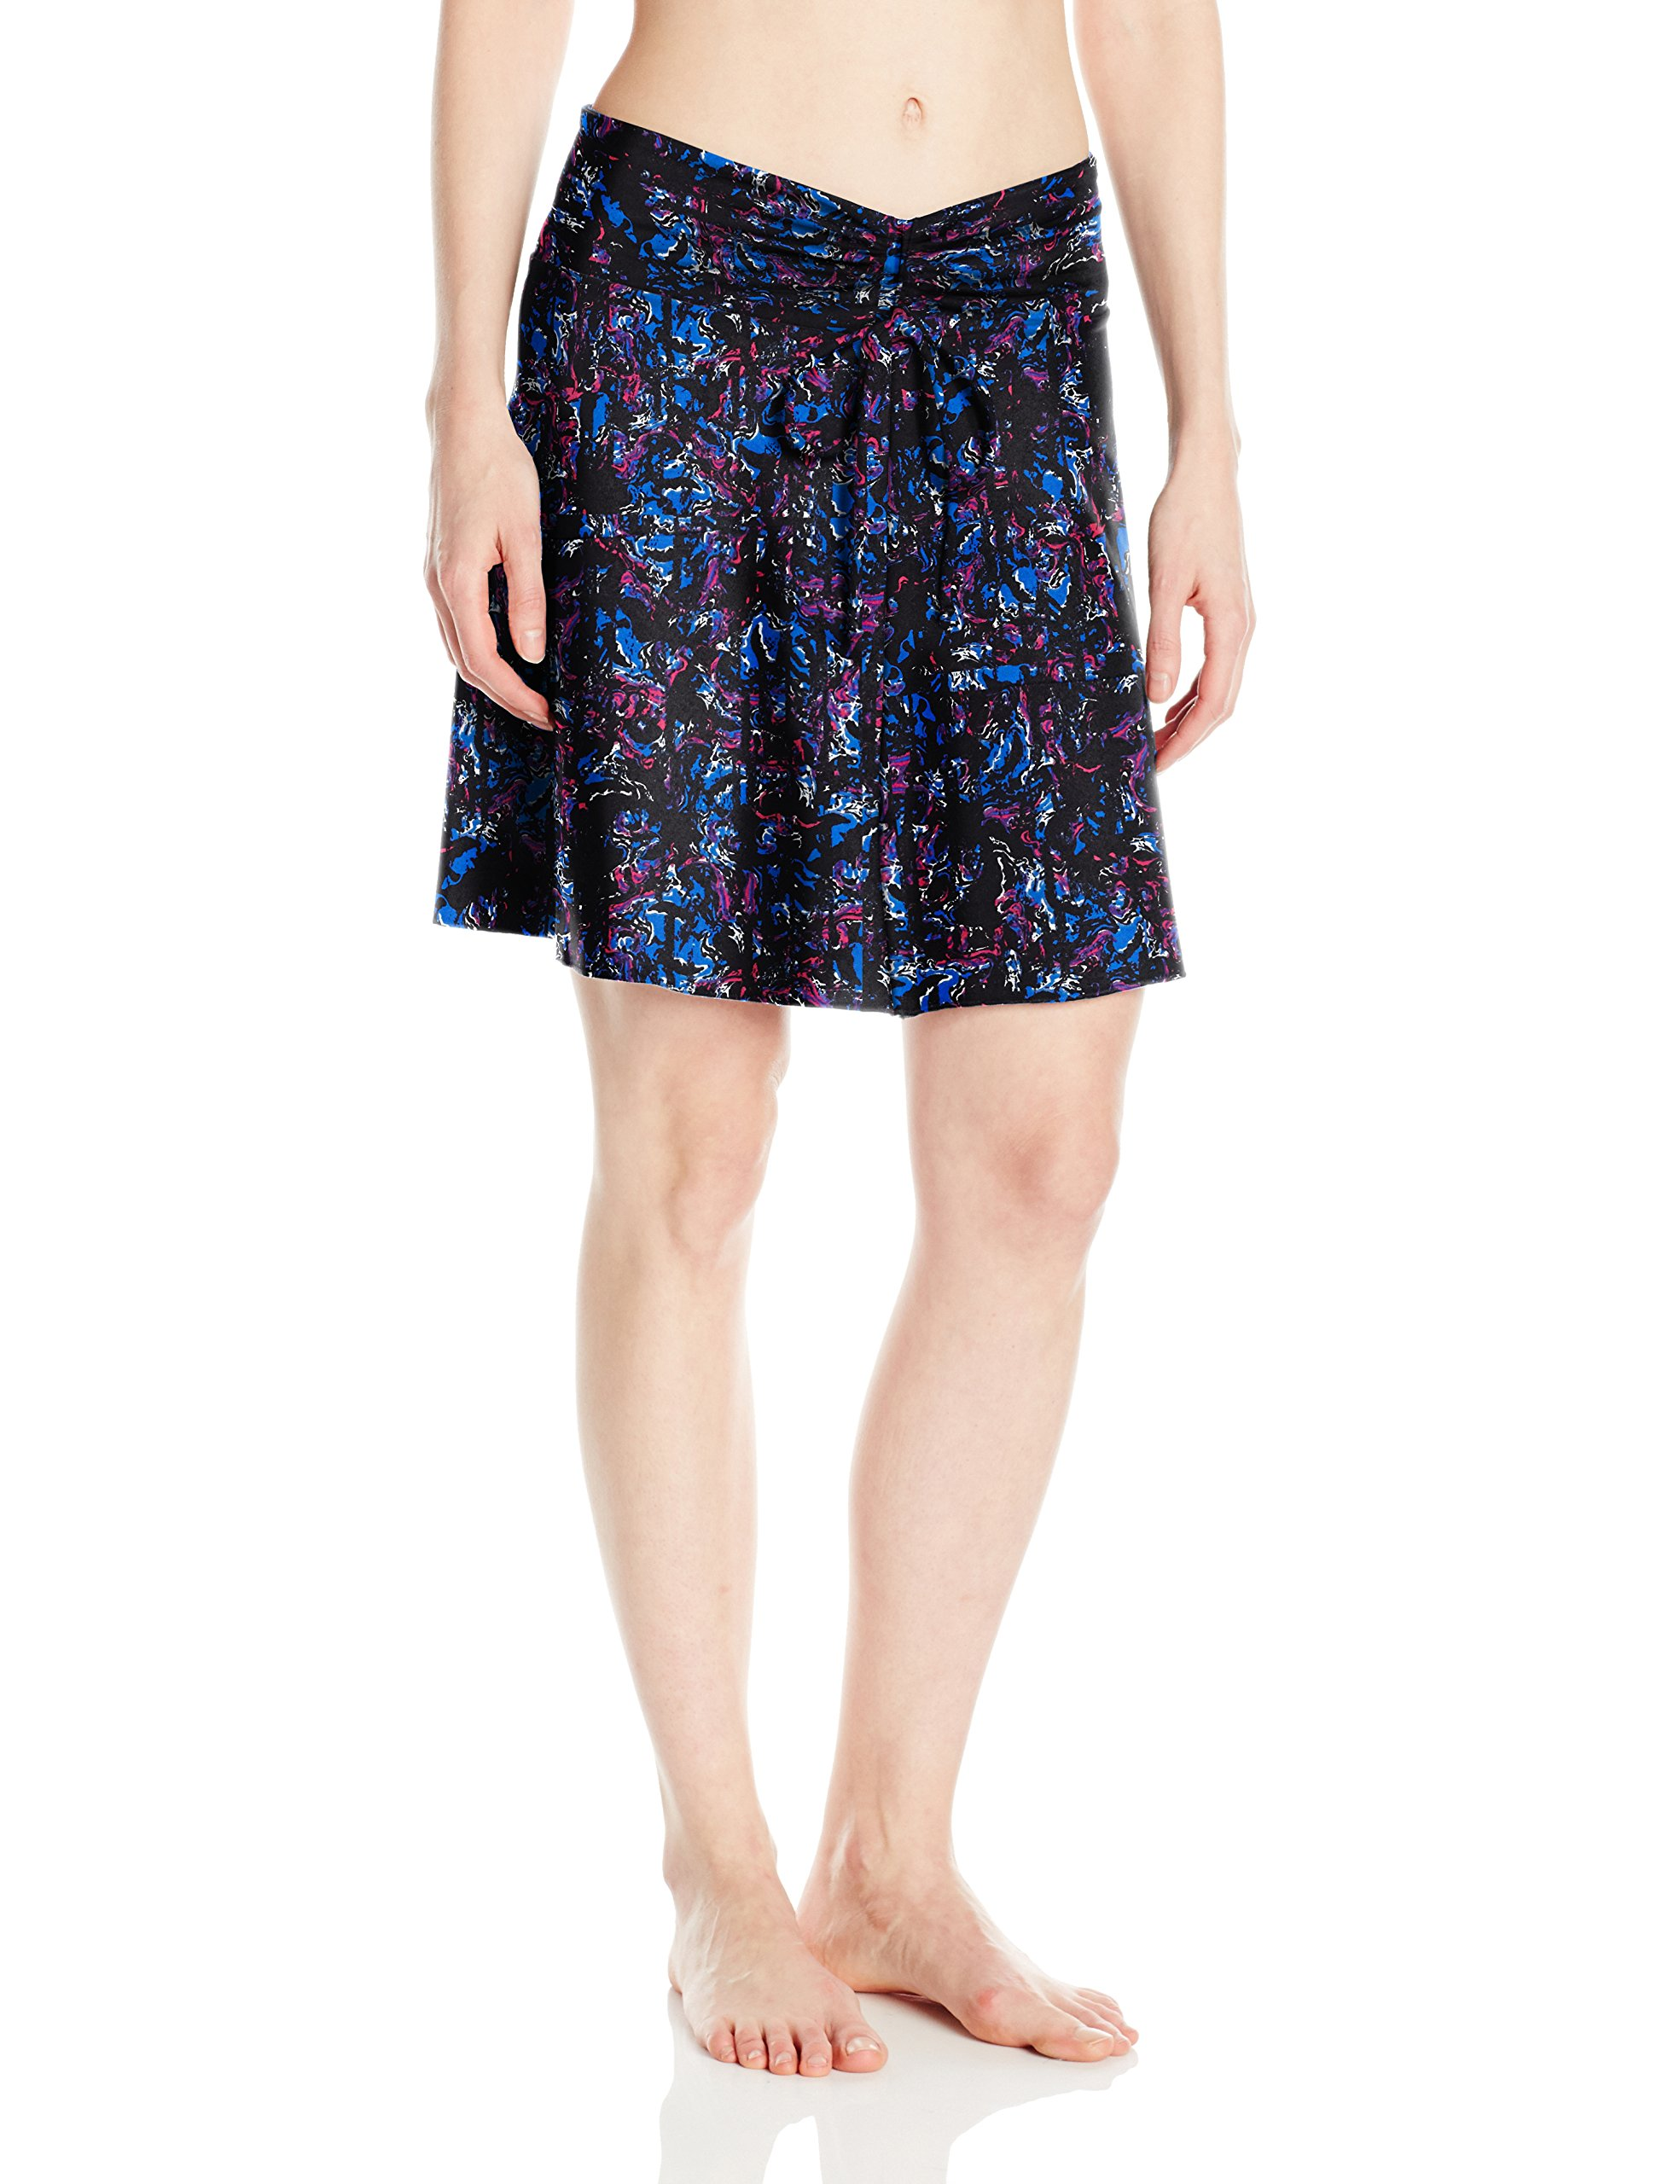 Soybu Women's Serendipity Skirt, Medium, Slick